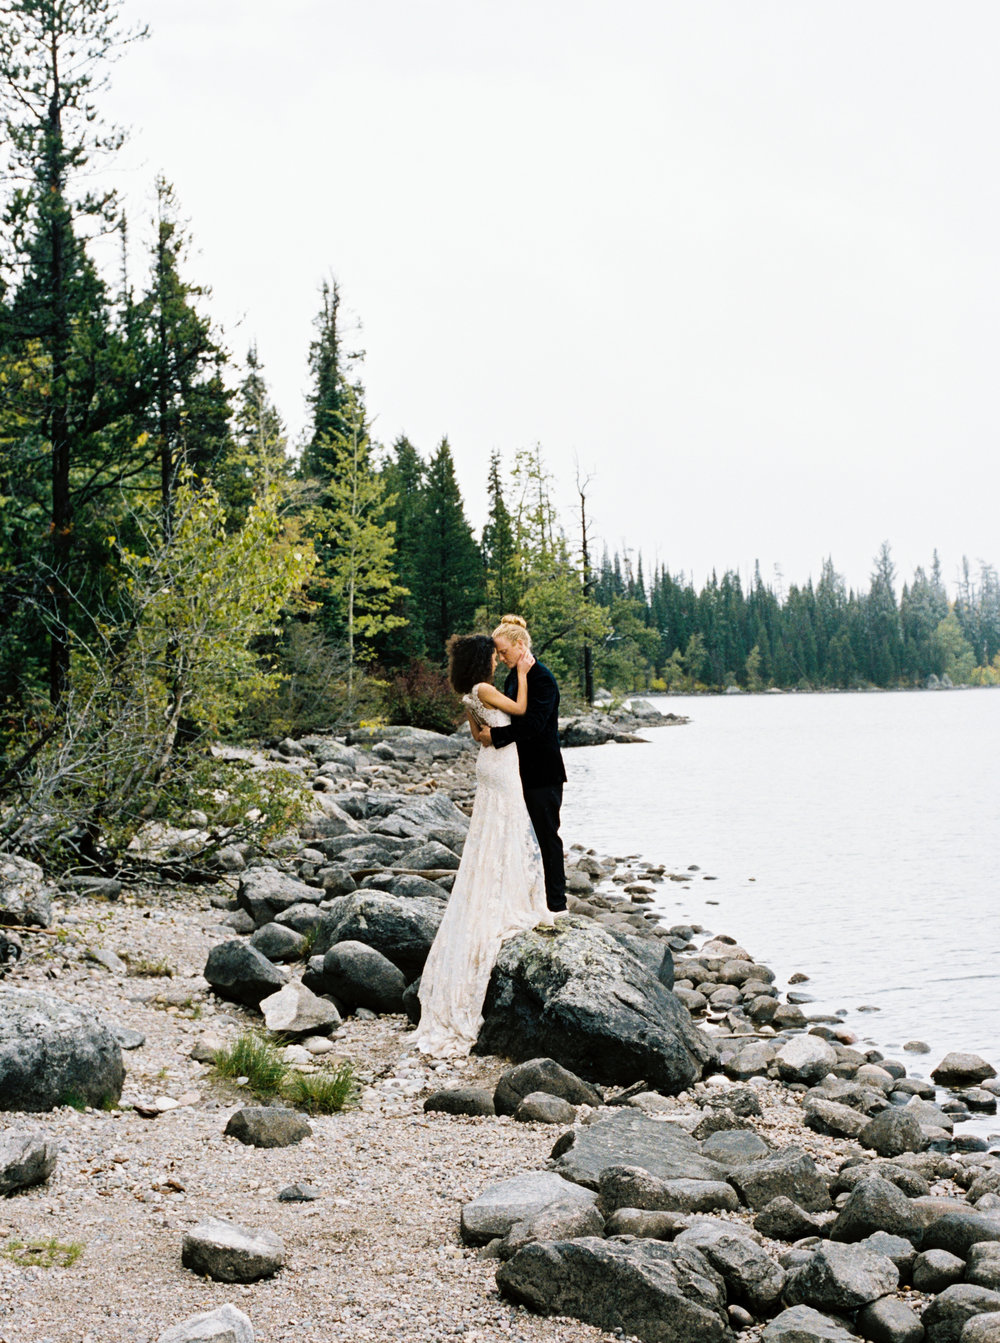 Wedding Photographer Jenny Losee (3 of 3).jpg